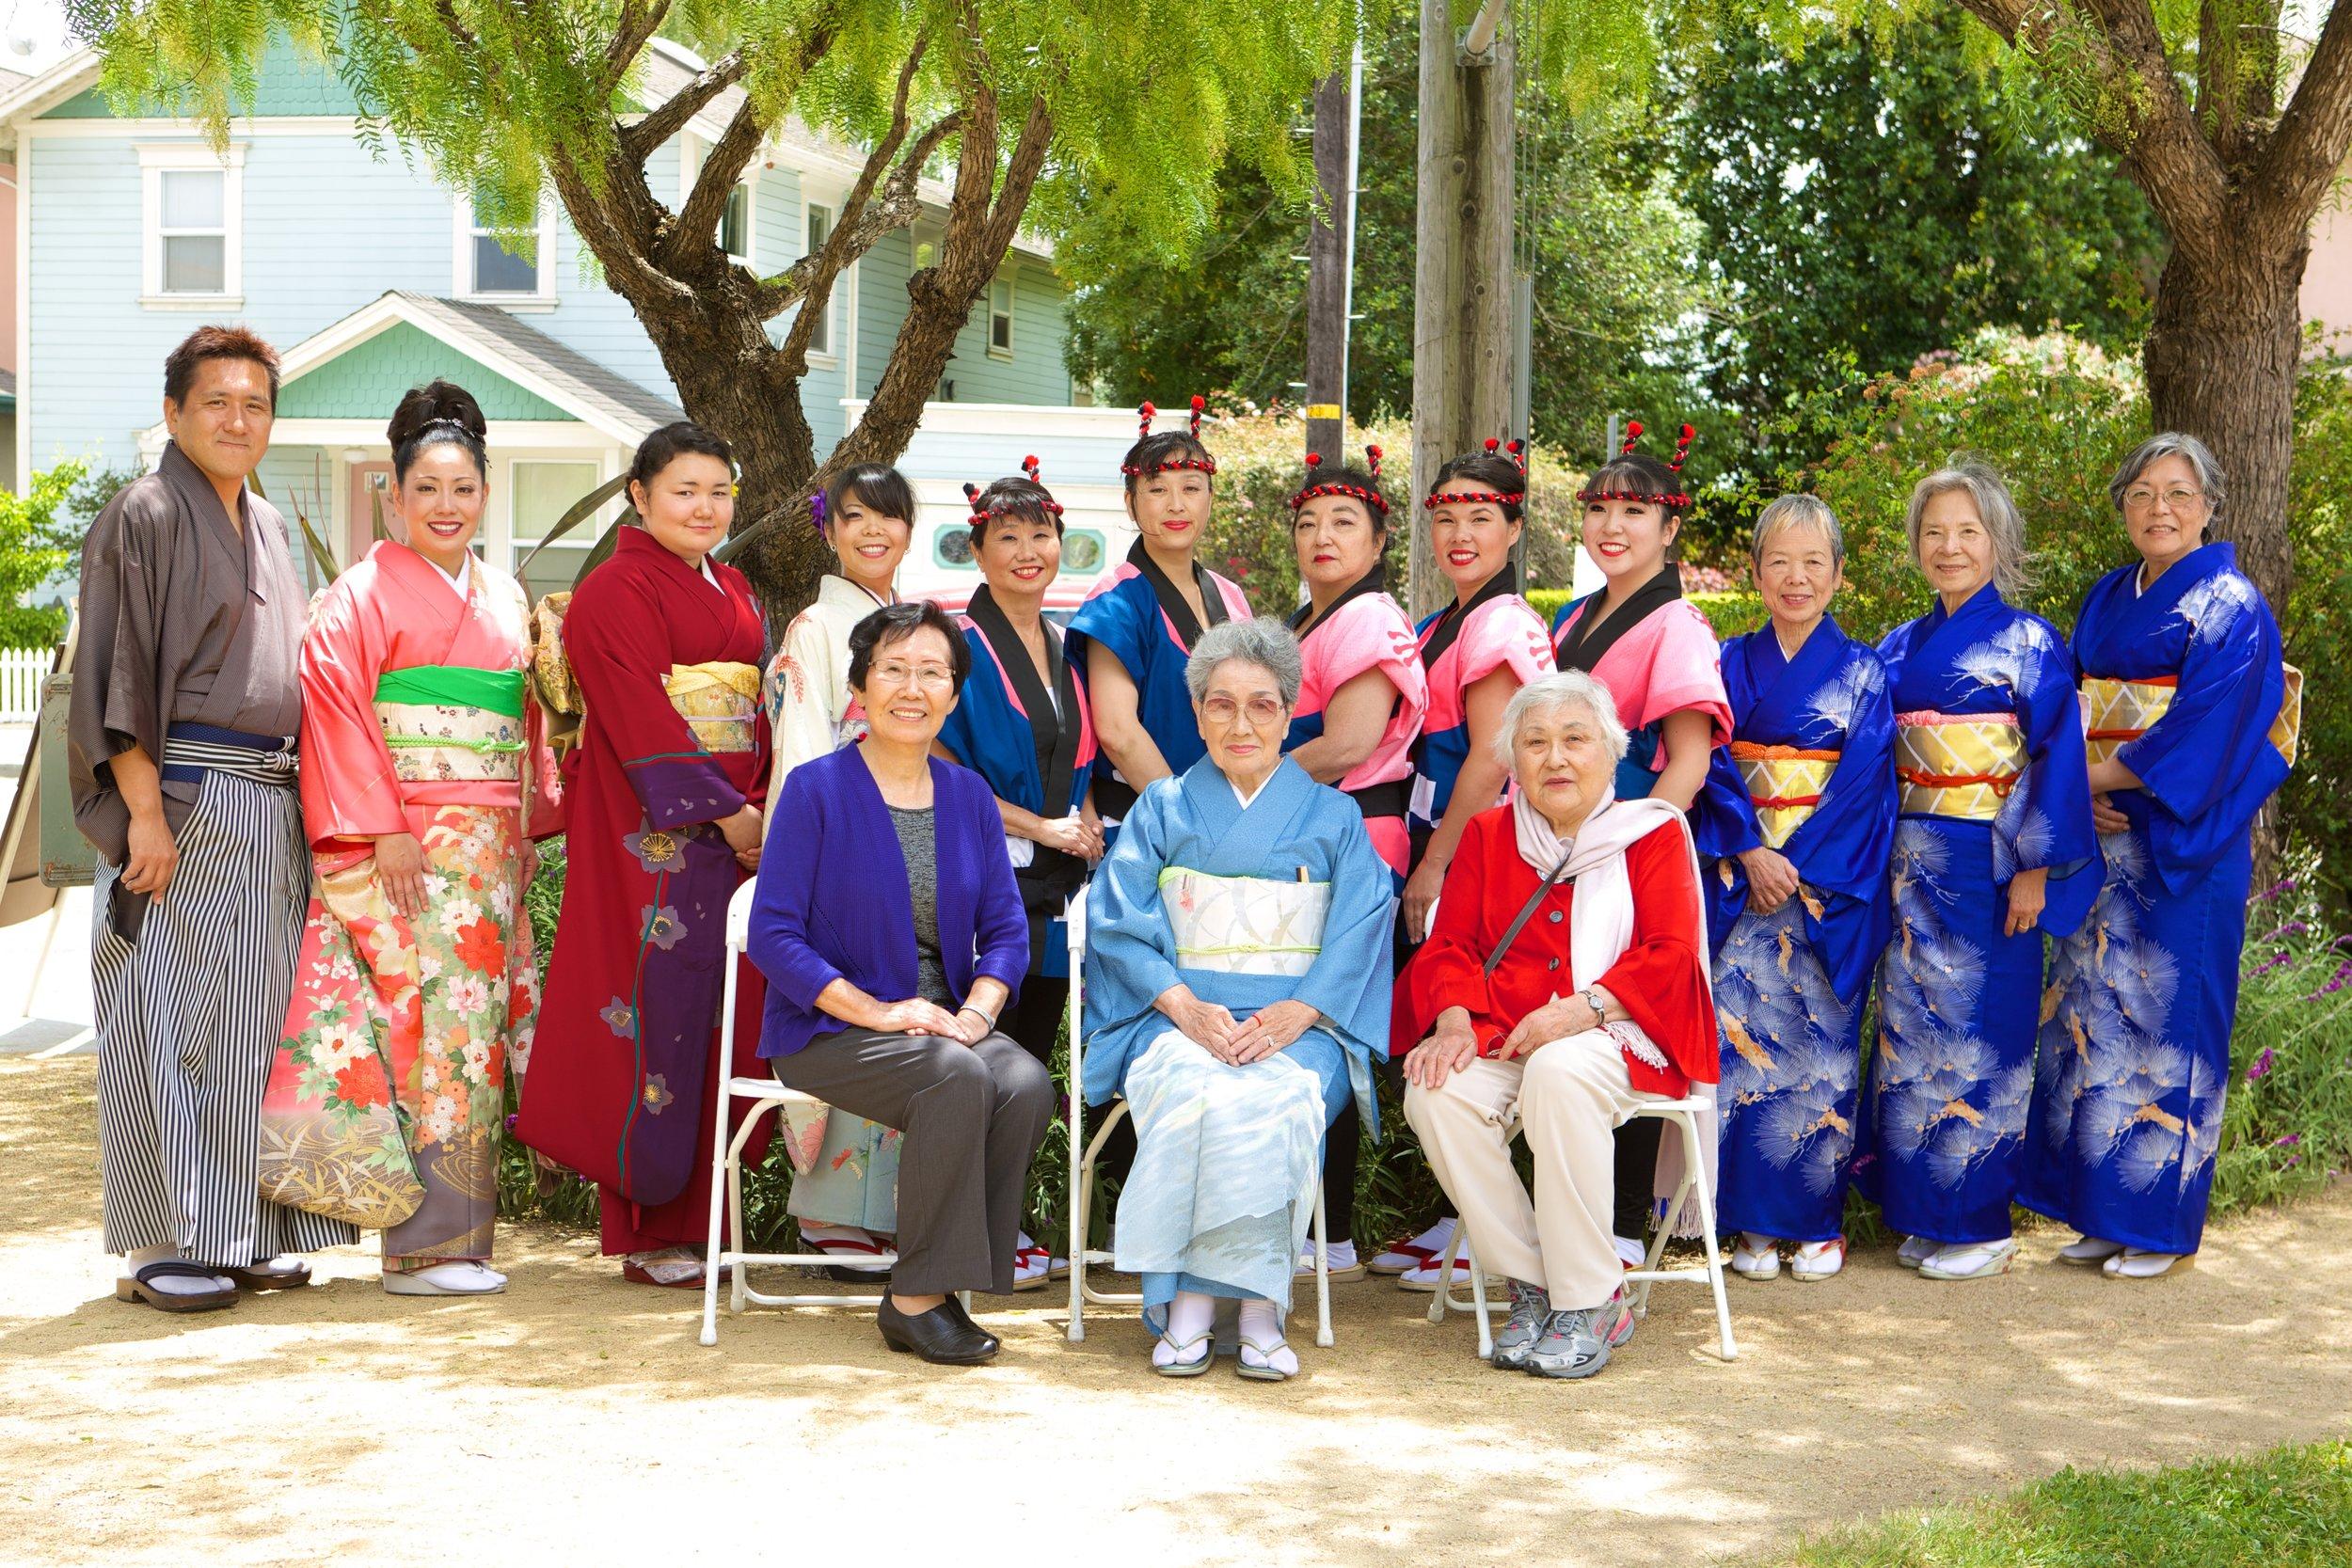 matsutoyo-kai---tanoshimi-kai---toyokiku-kai---japanese-cultural-fair-of-santa-cruz-2015_19408726140_o.jpg